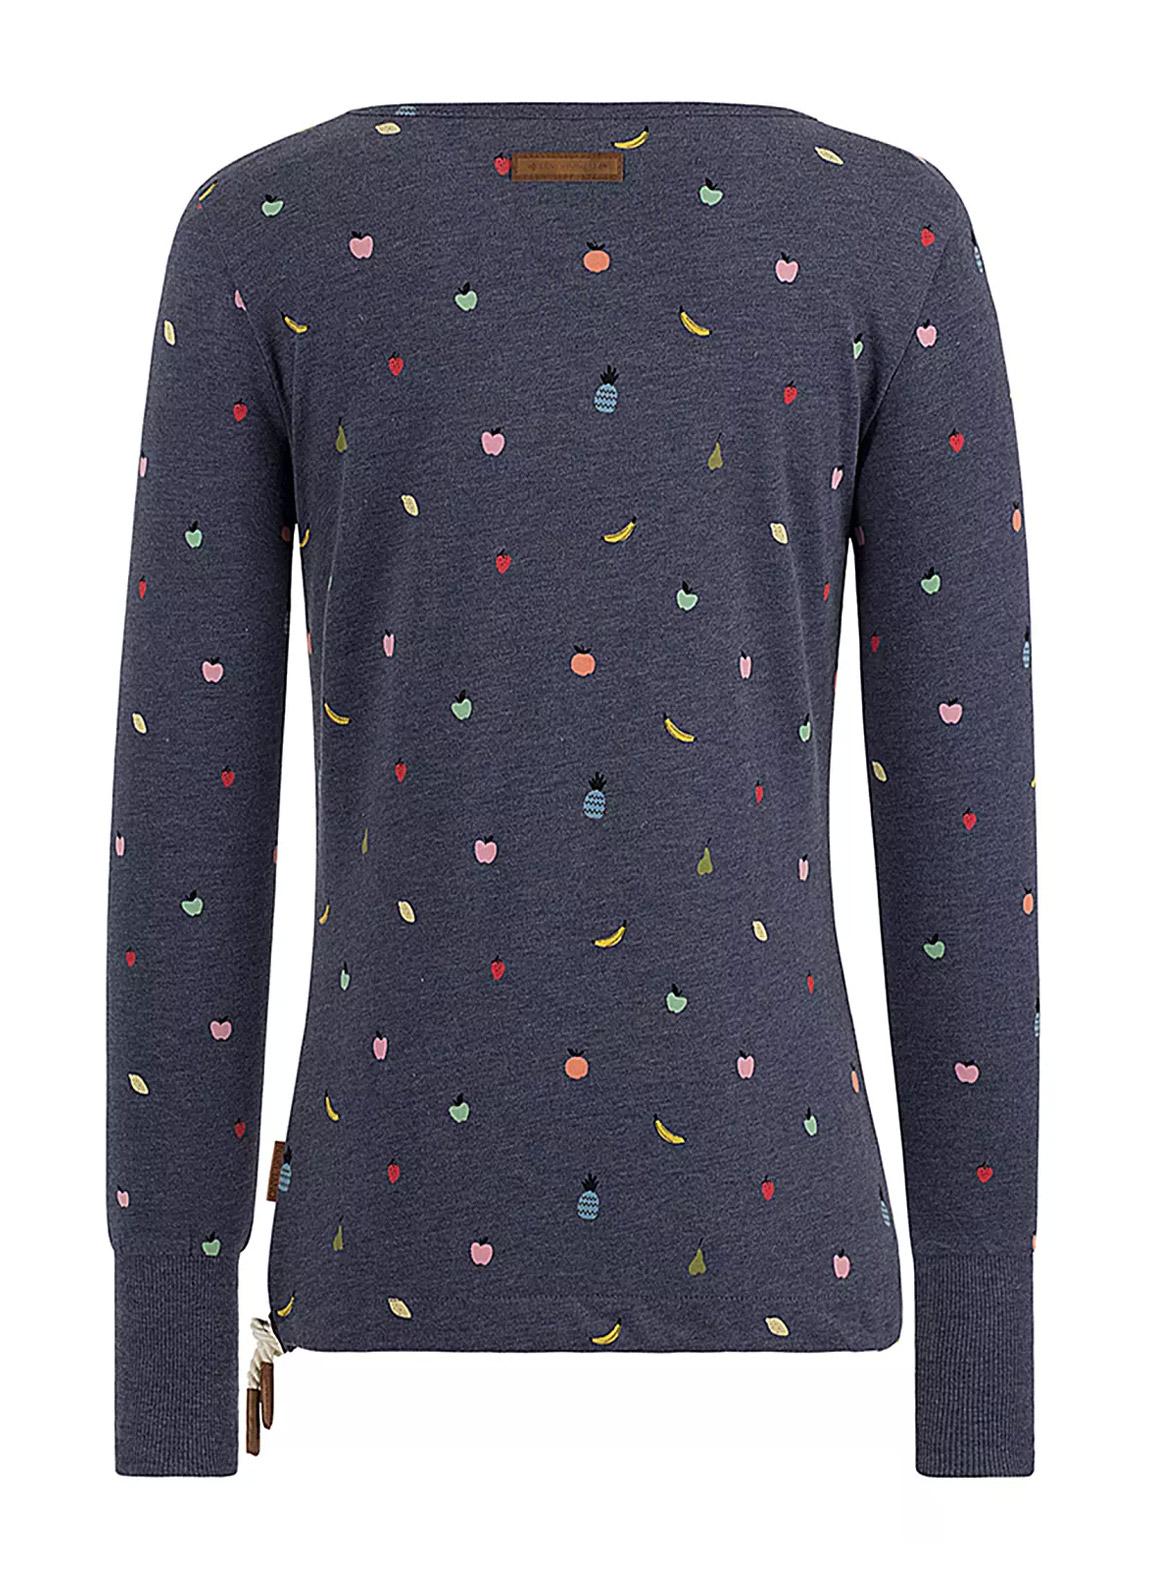 Naketano Damen Sweater Tittenfick V12 Il Sweater: Bekleidung